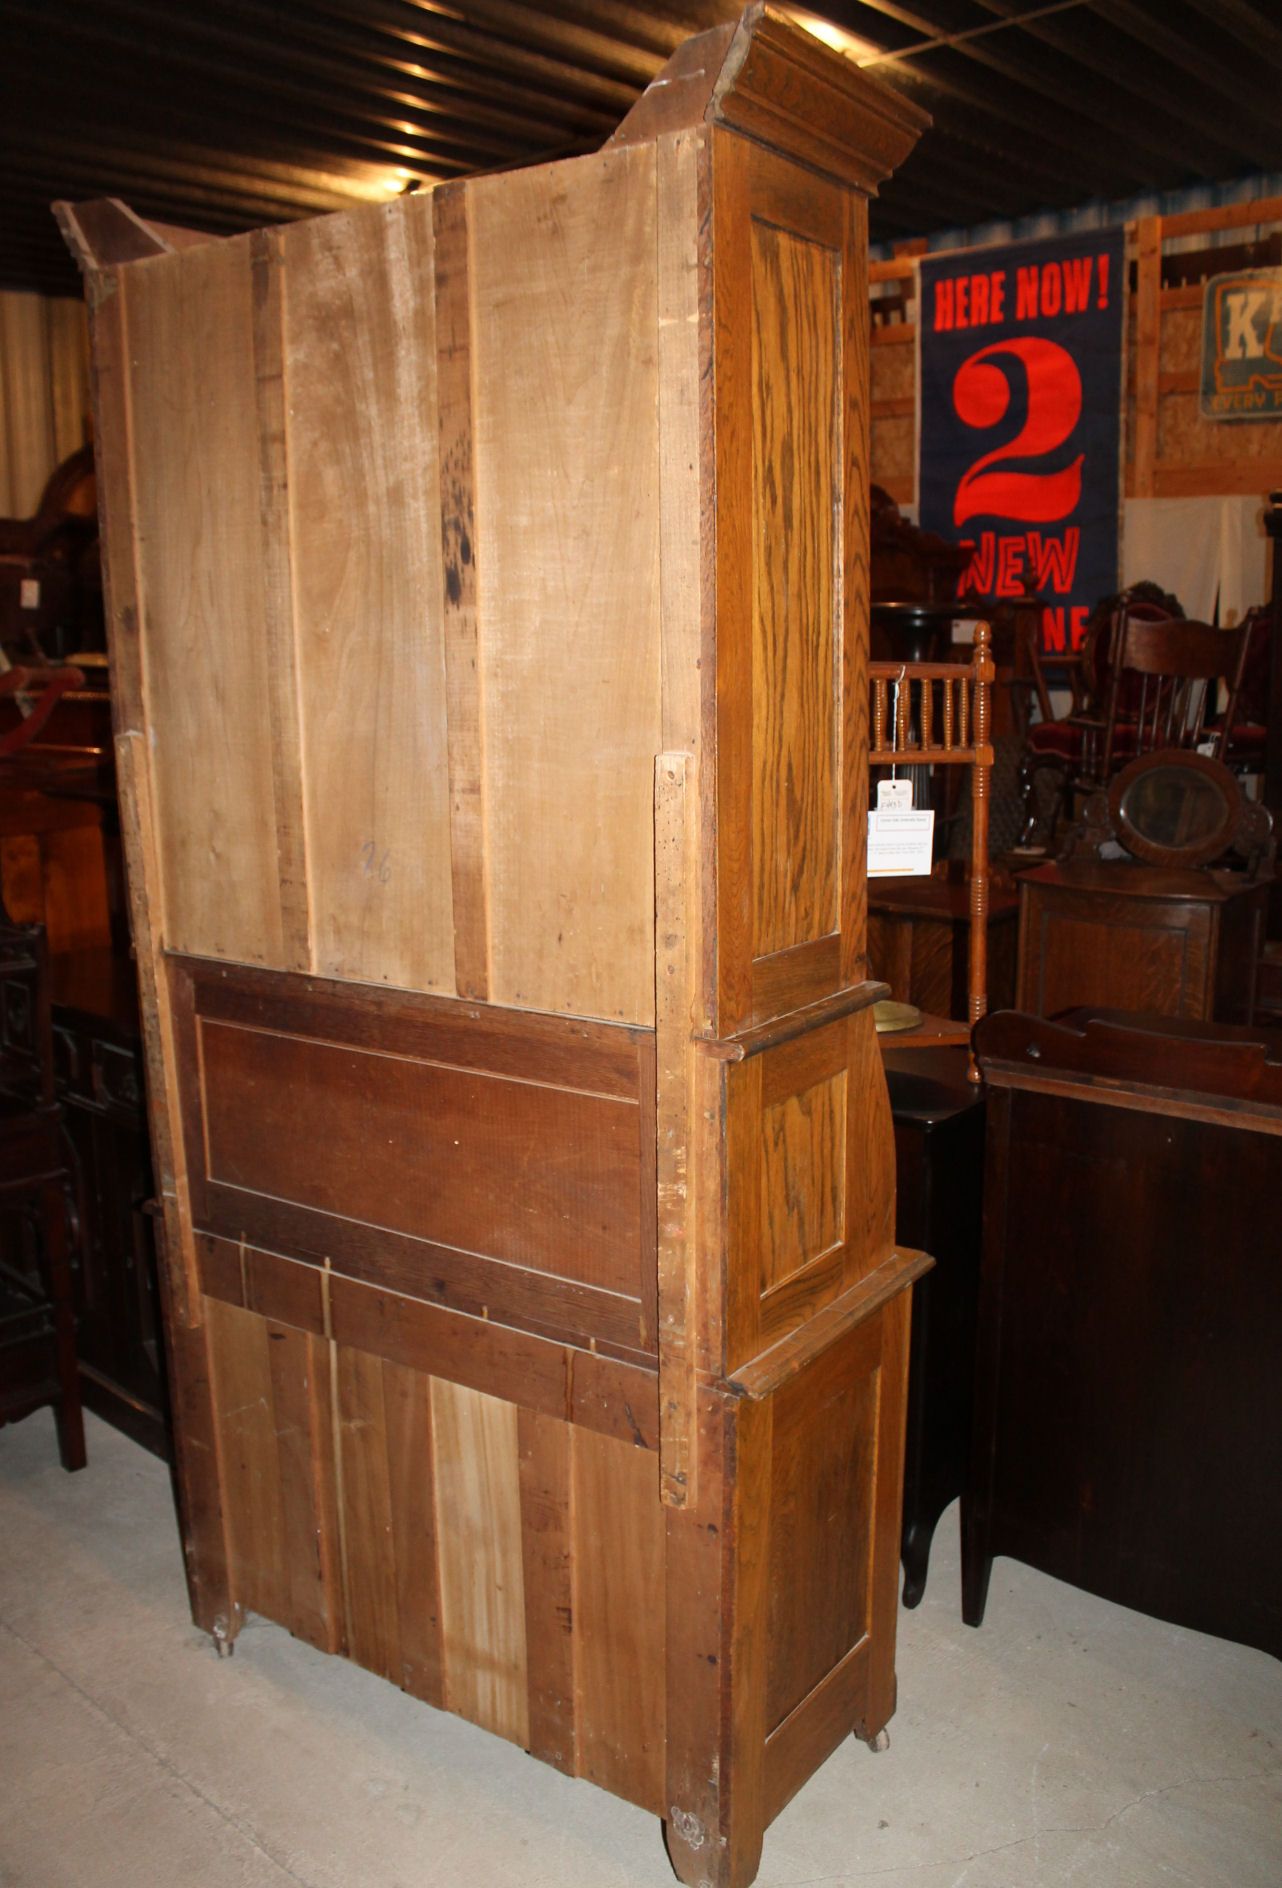 kitchen cabinet accessories stainless steel corner shelf bargain john's antiques » blog archive antique oak drop ...